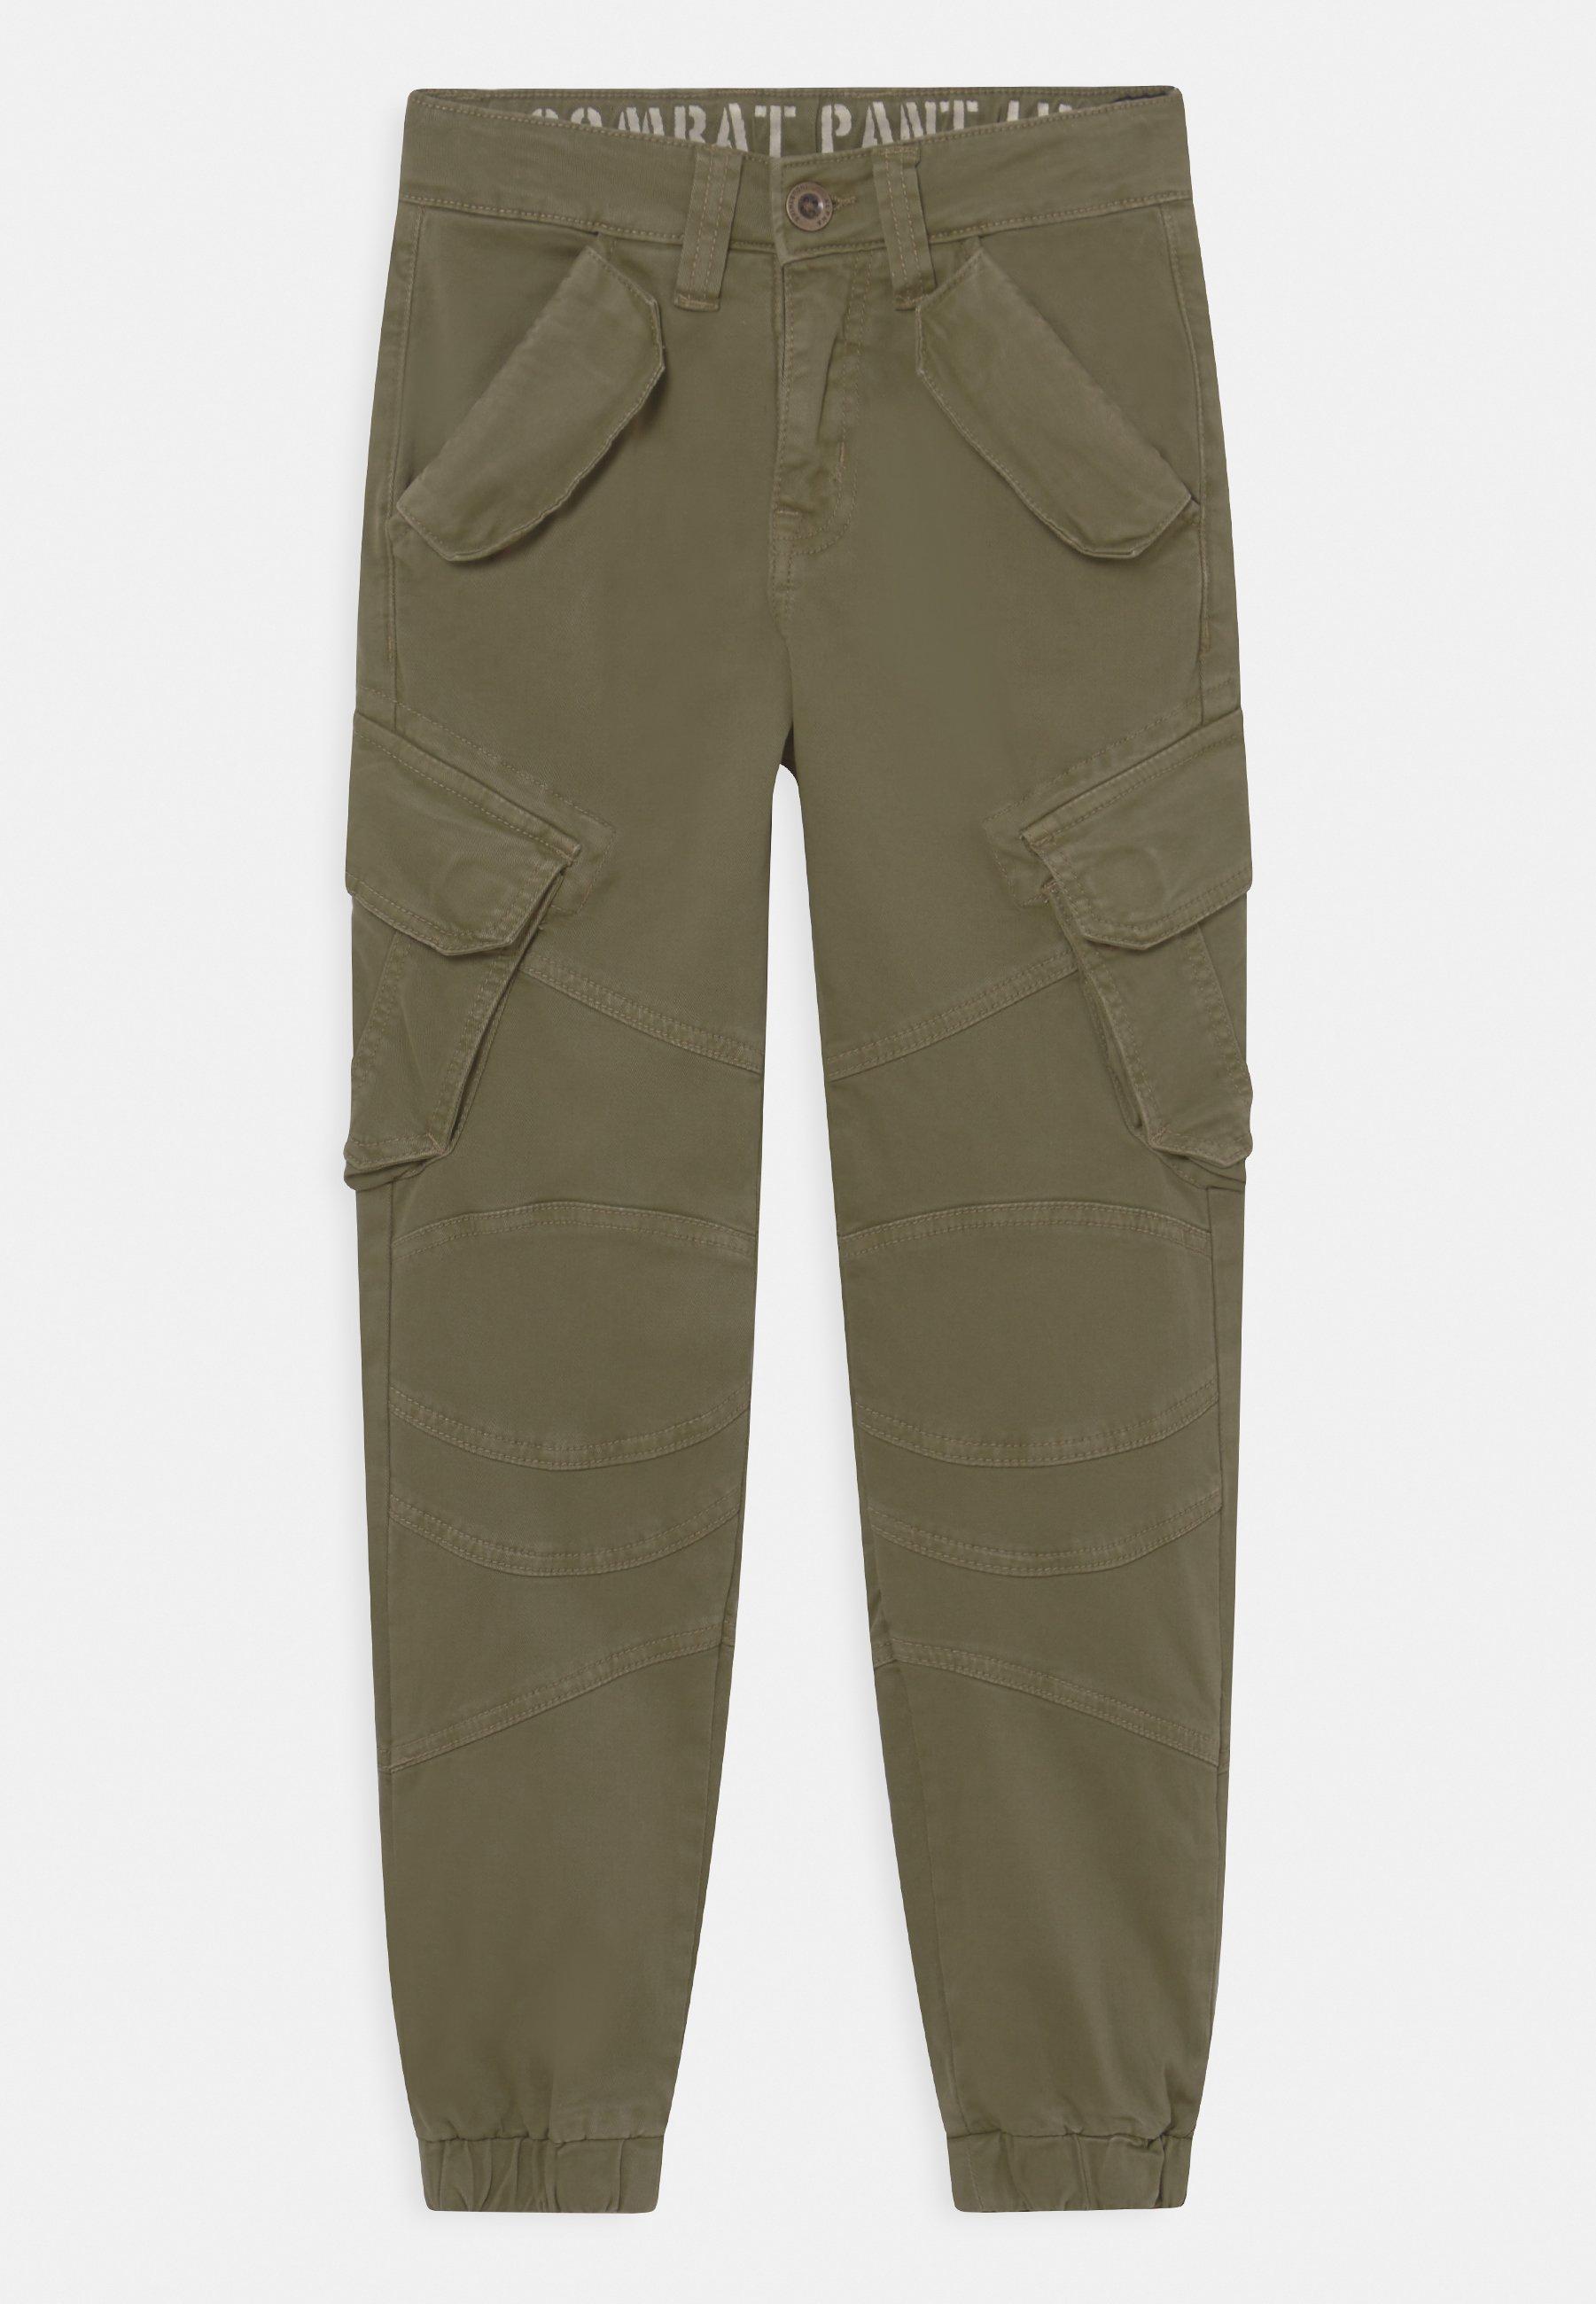 Bambini COMBAT - Pantaloni cargo